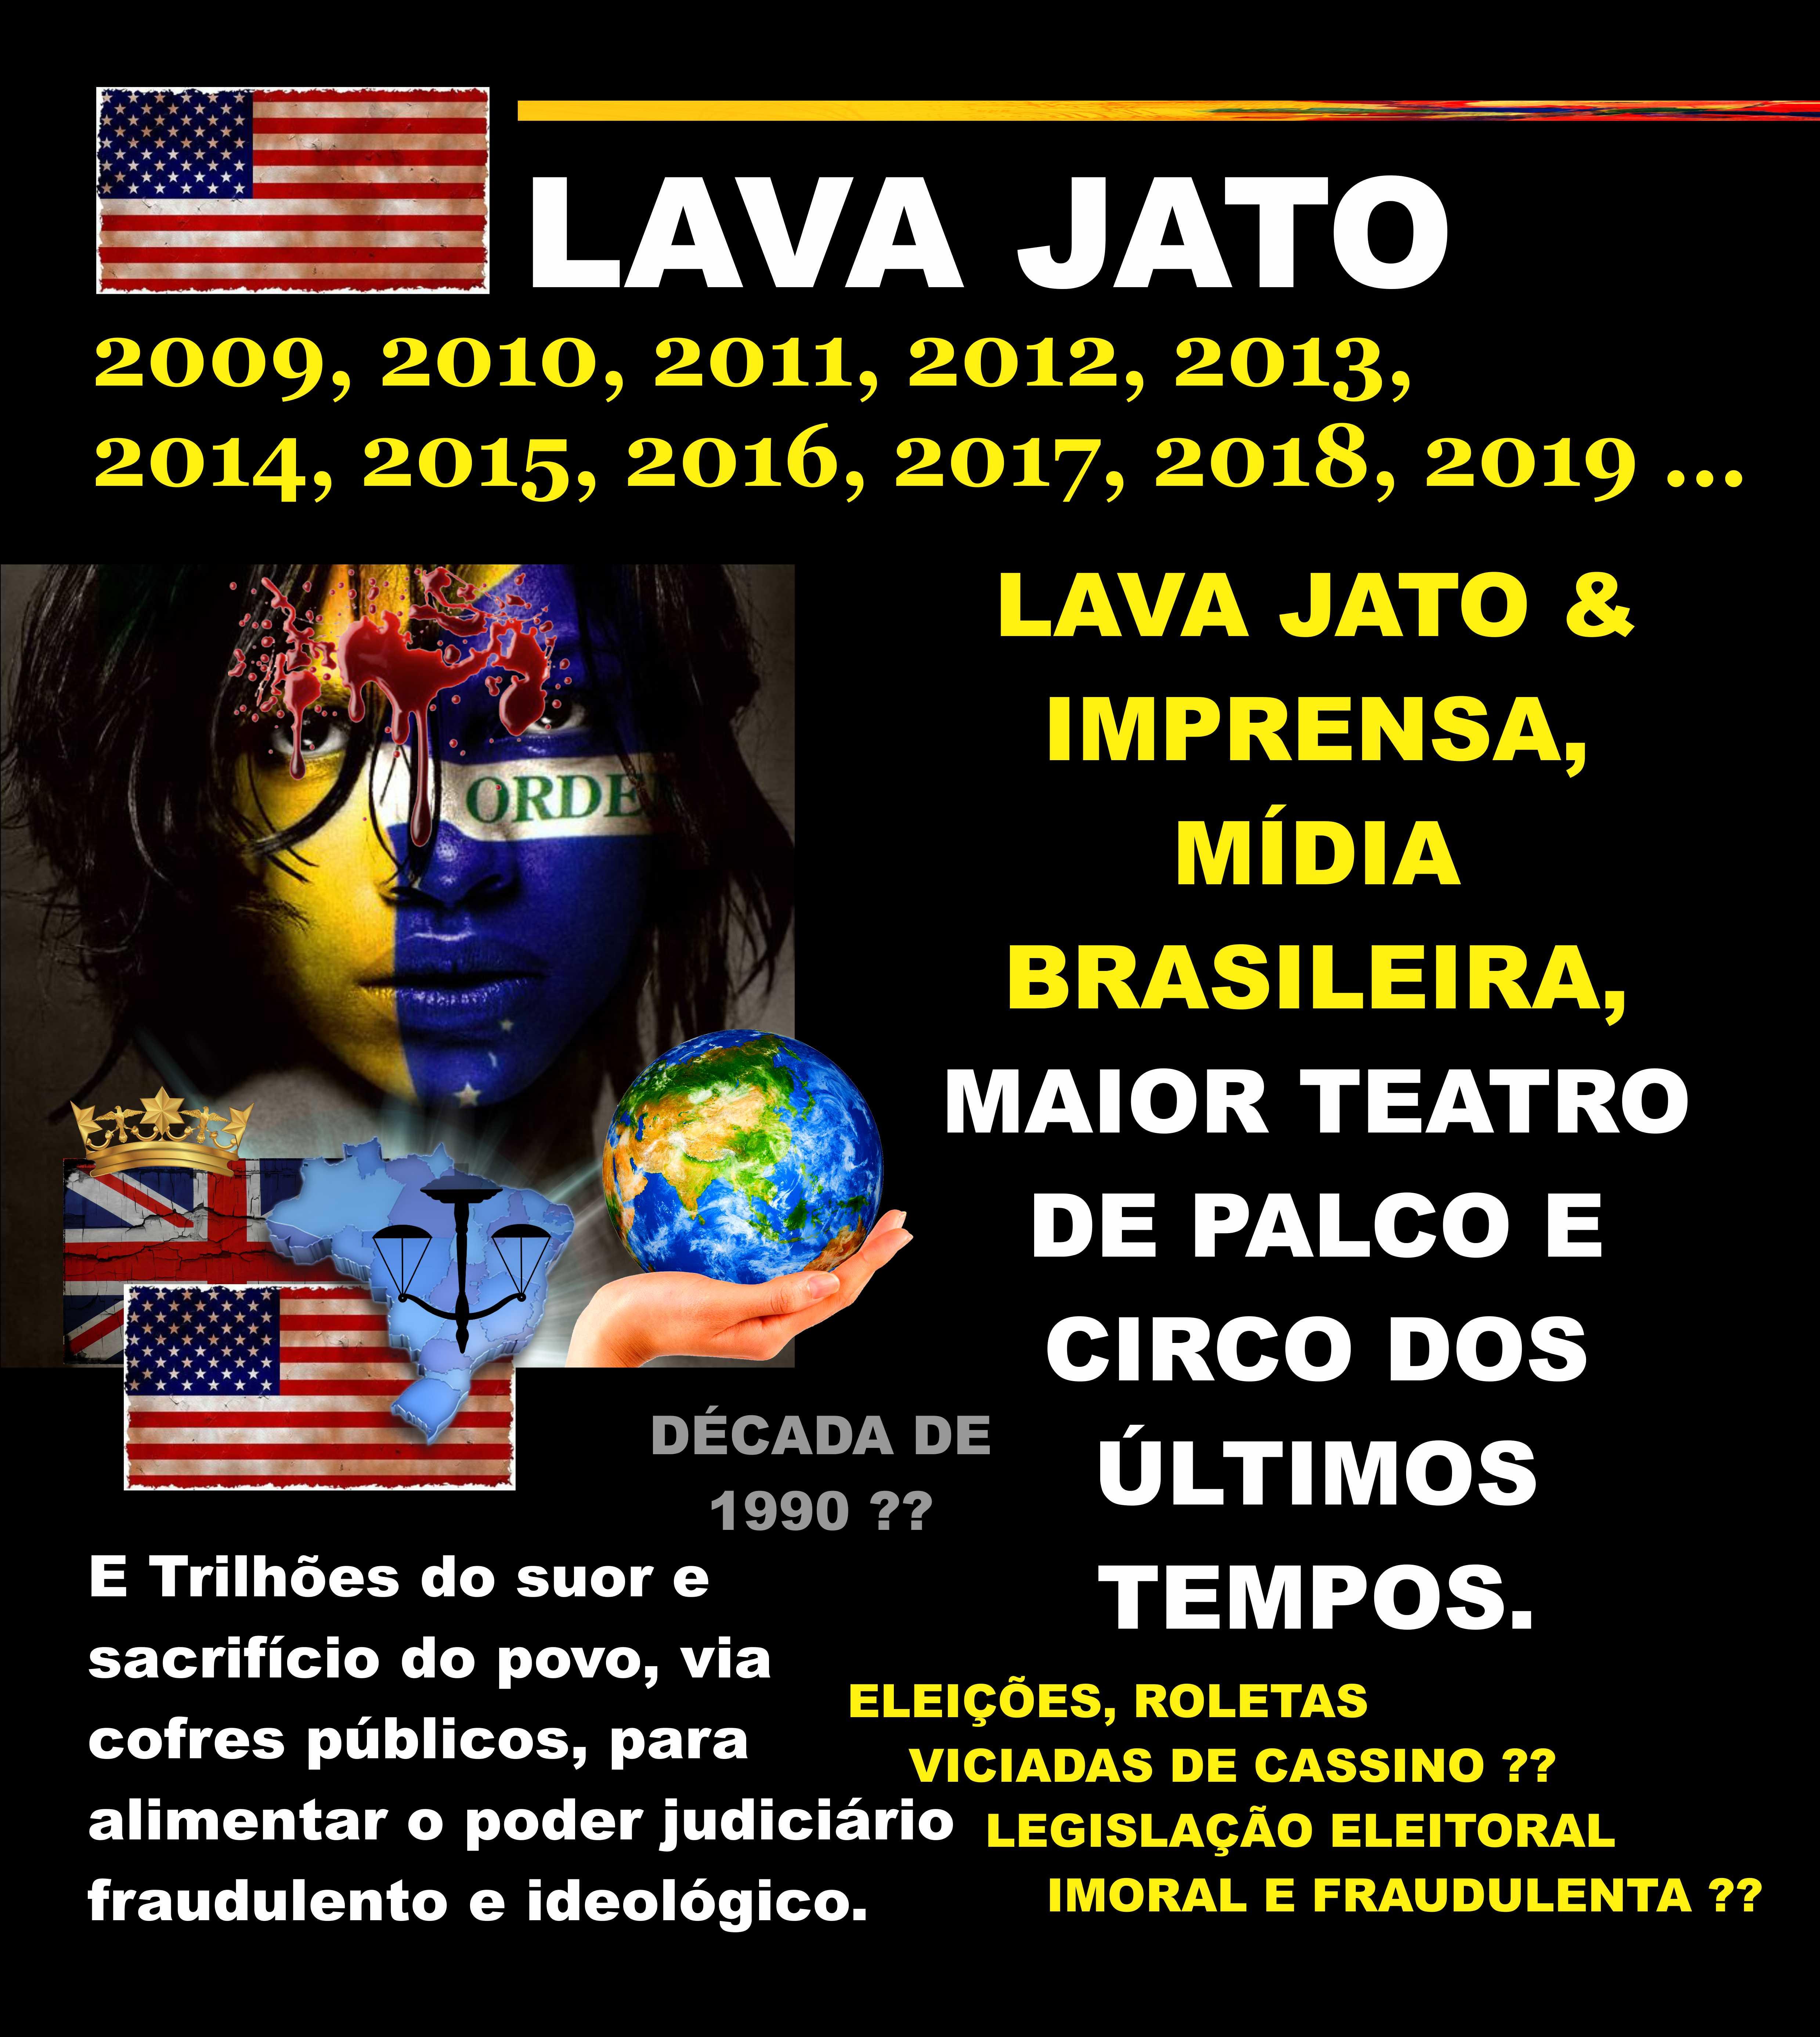 LAVA JATO FRAUDULENTA E IDEOLÓGICA 01